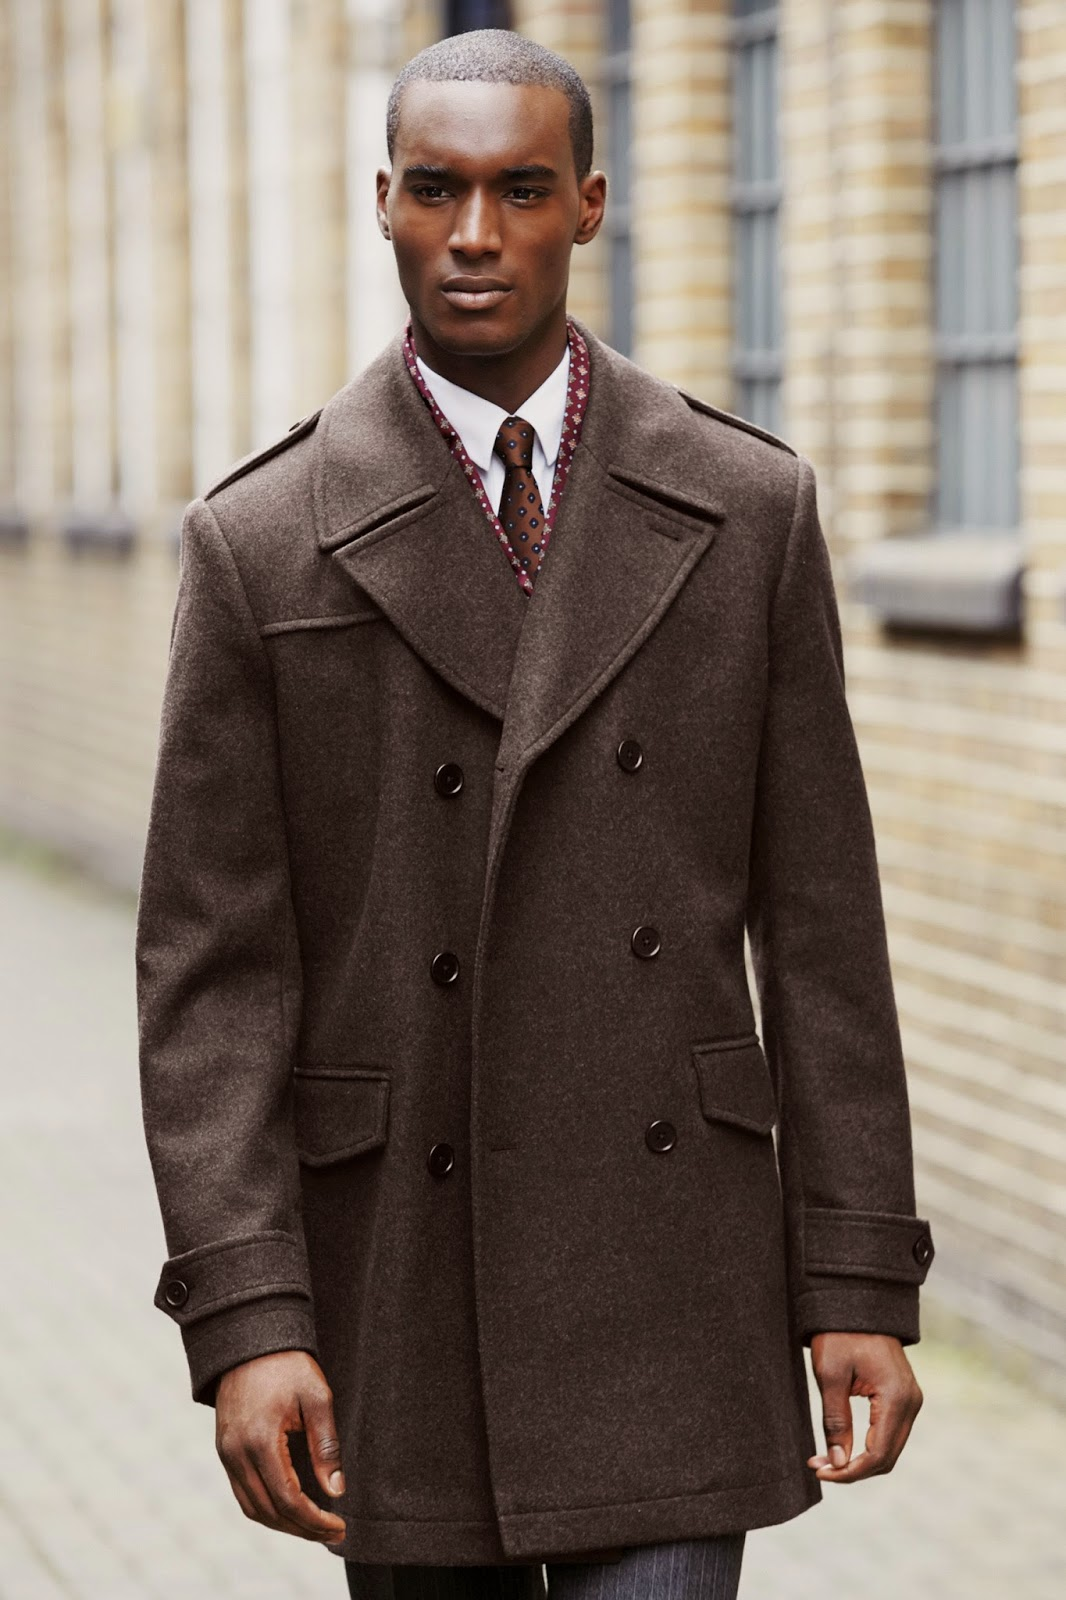 Five Cool Coats by Next - That Dapper Chap